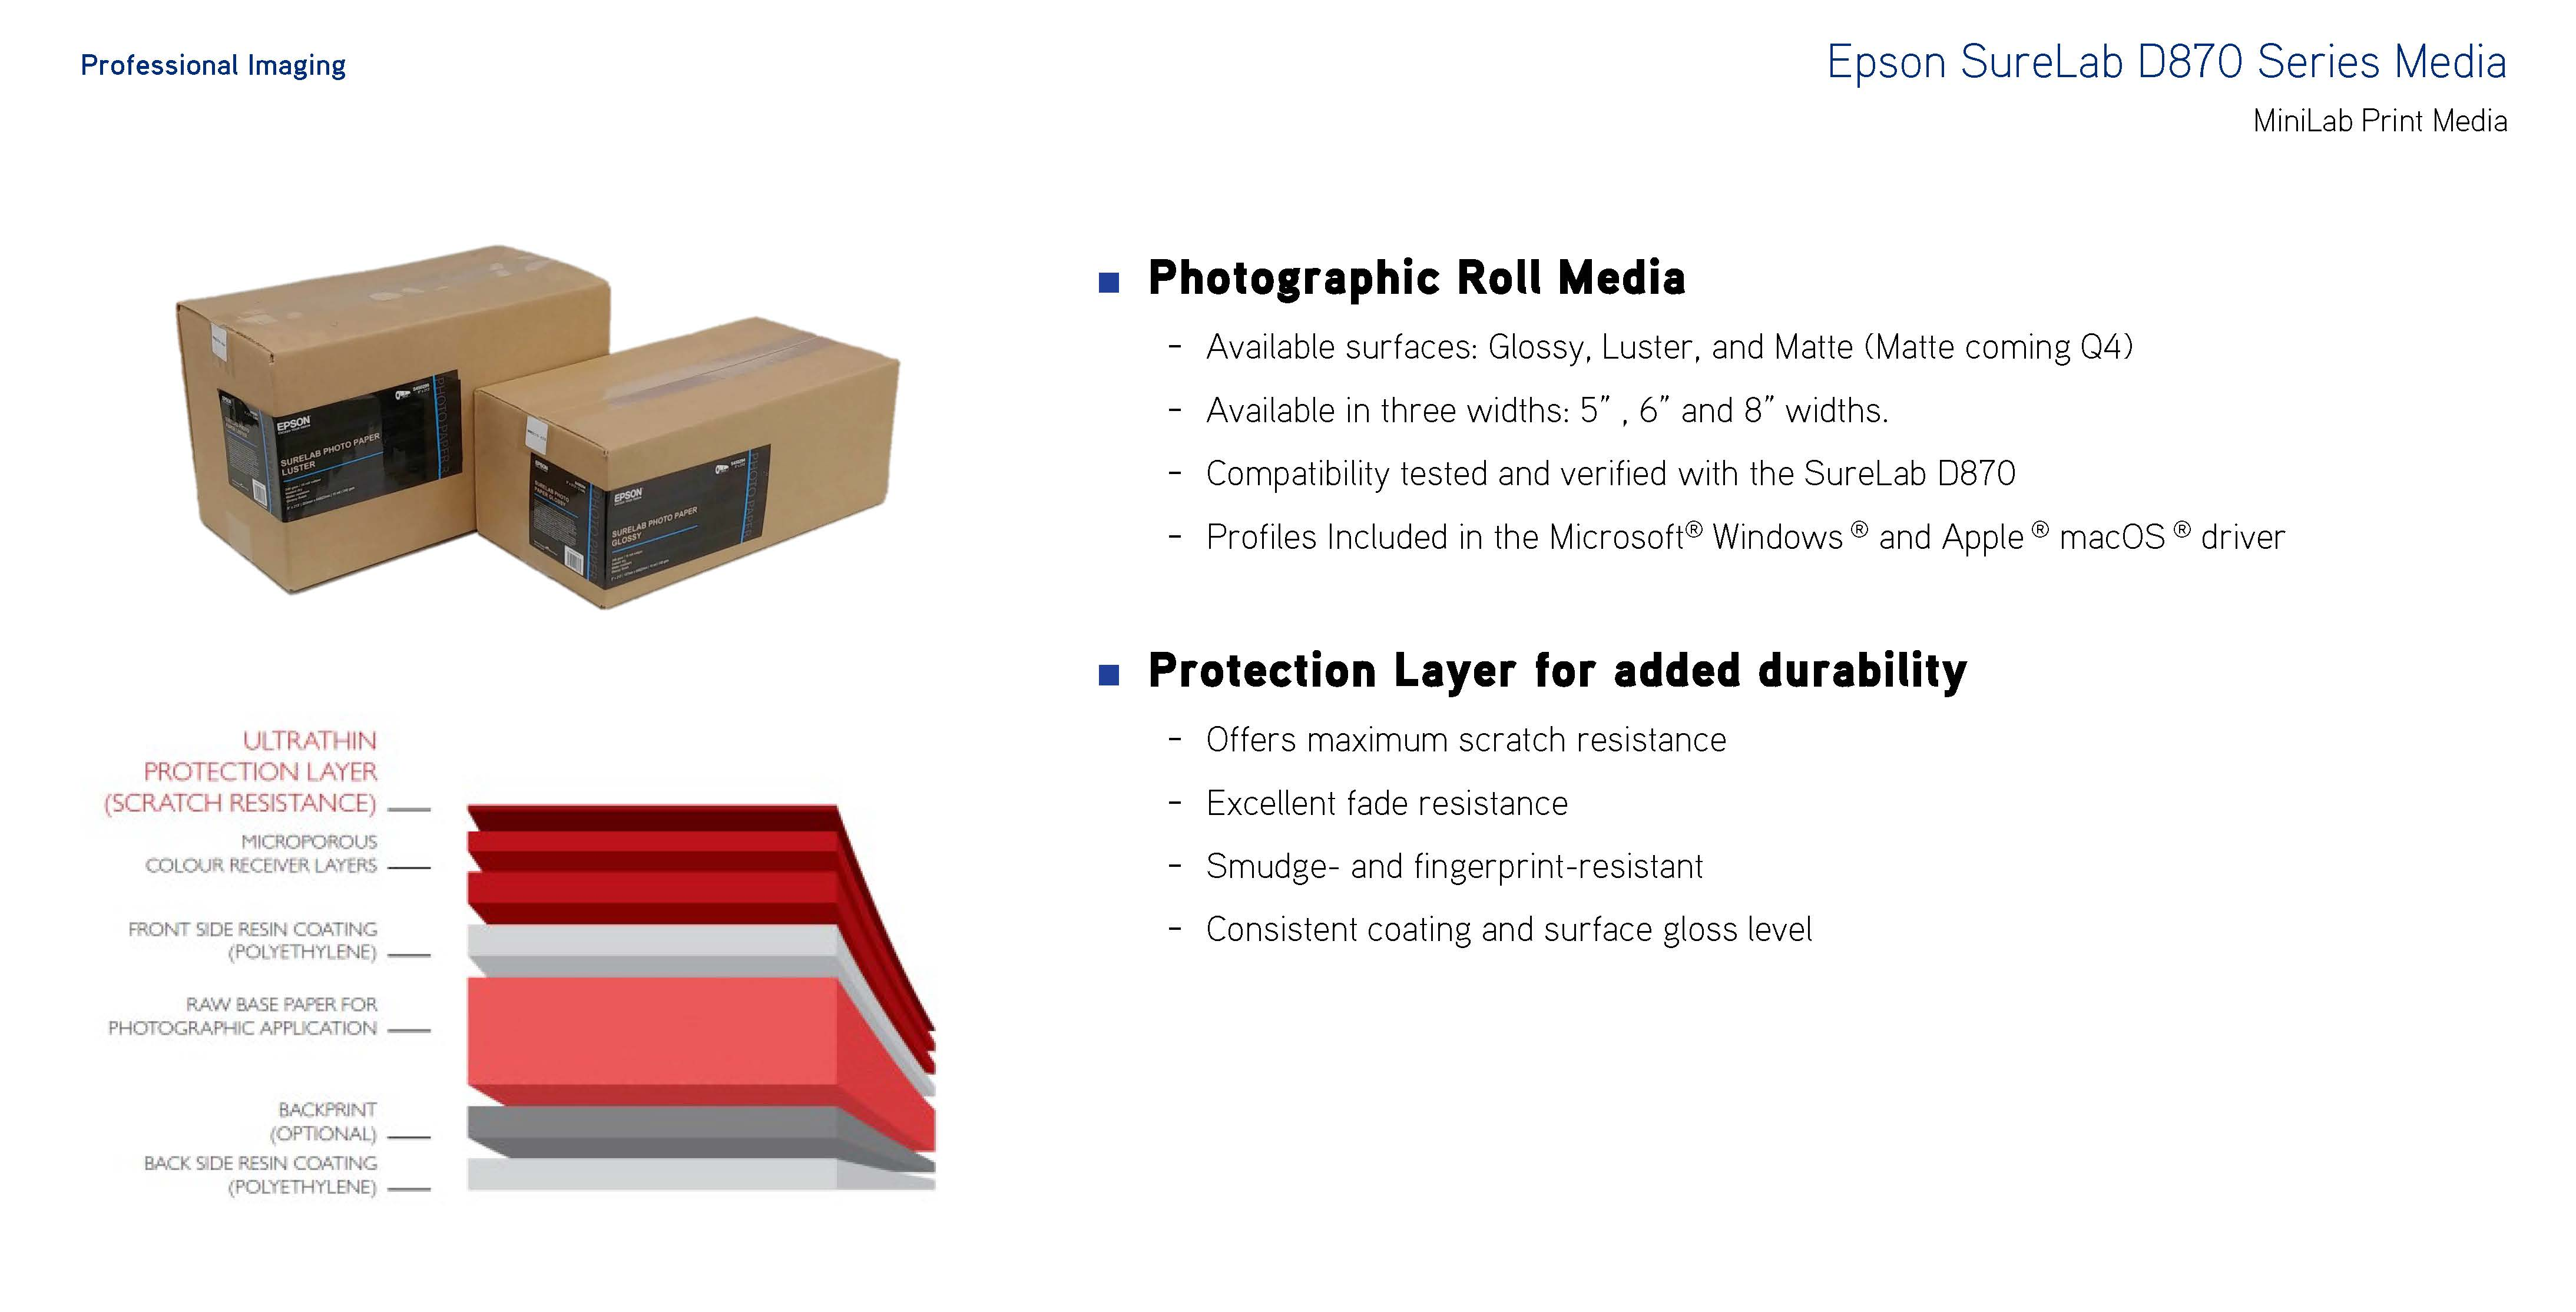 epson surelab D870 series media